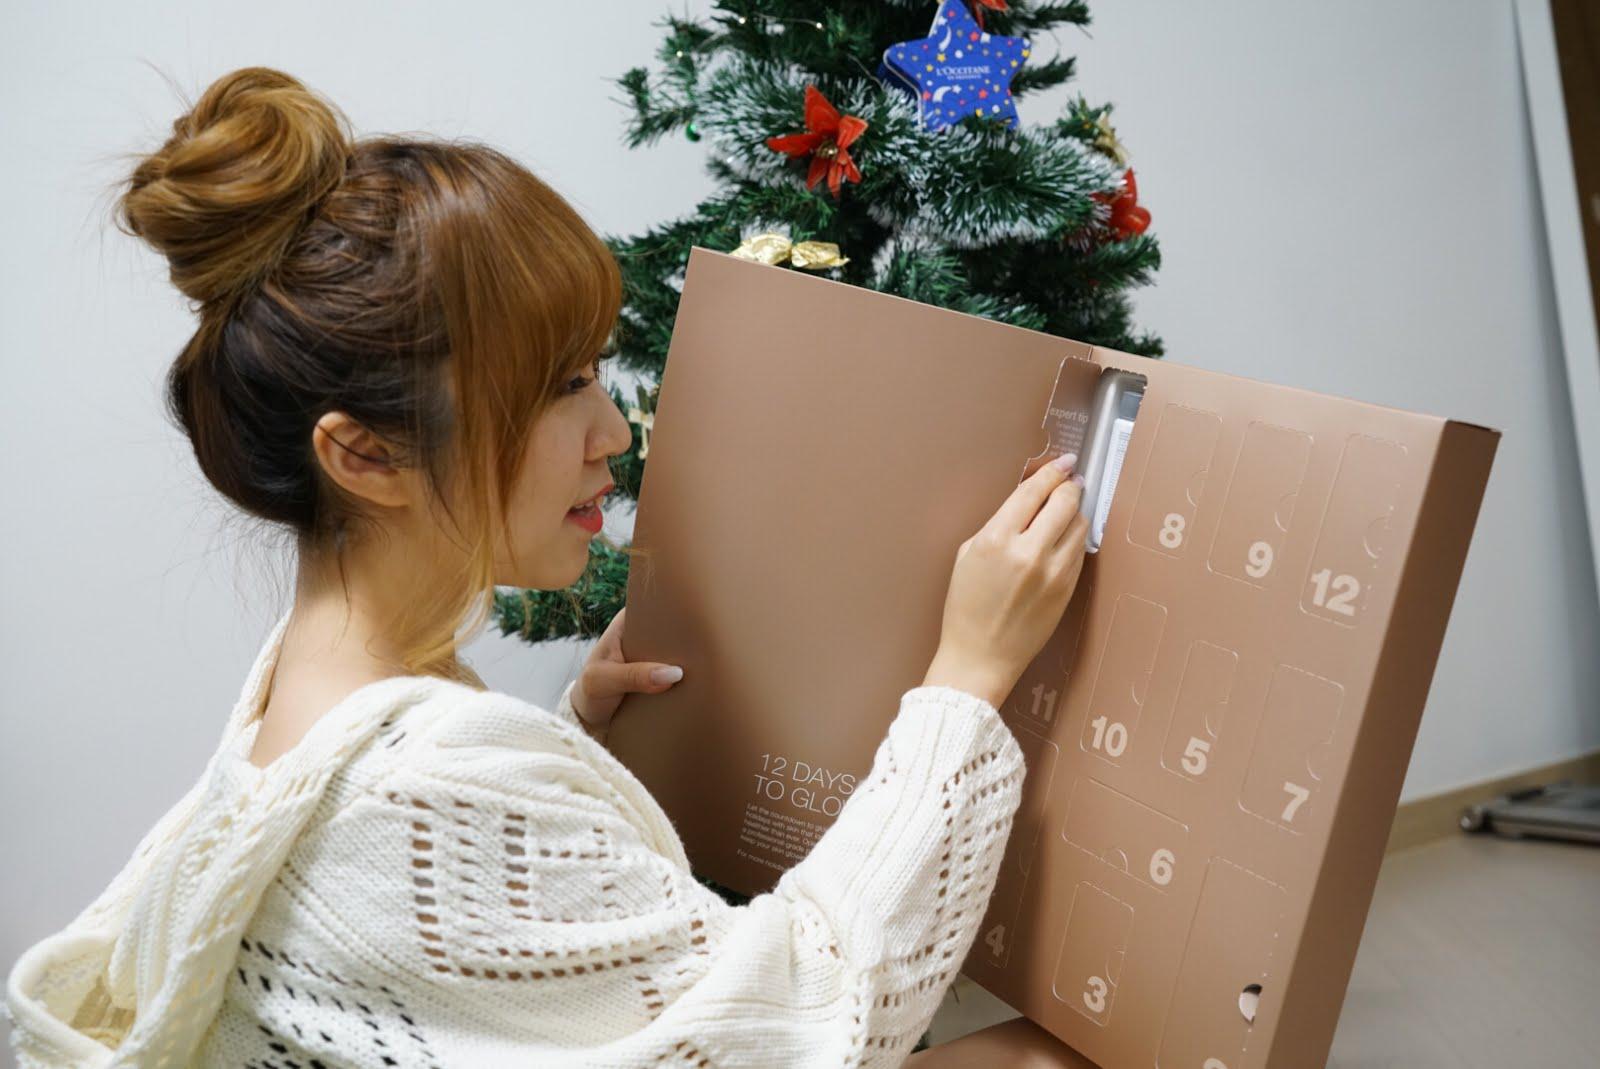 6a977c61d090 Beautylife HK - 聖誕倒數月曆丨Dermalogica 12 Days To Glow Advent ...